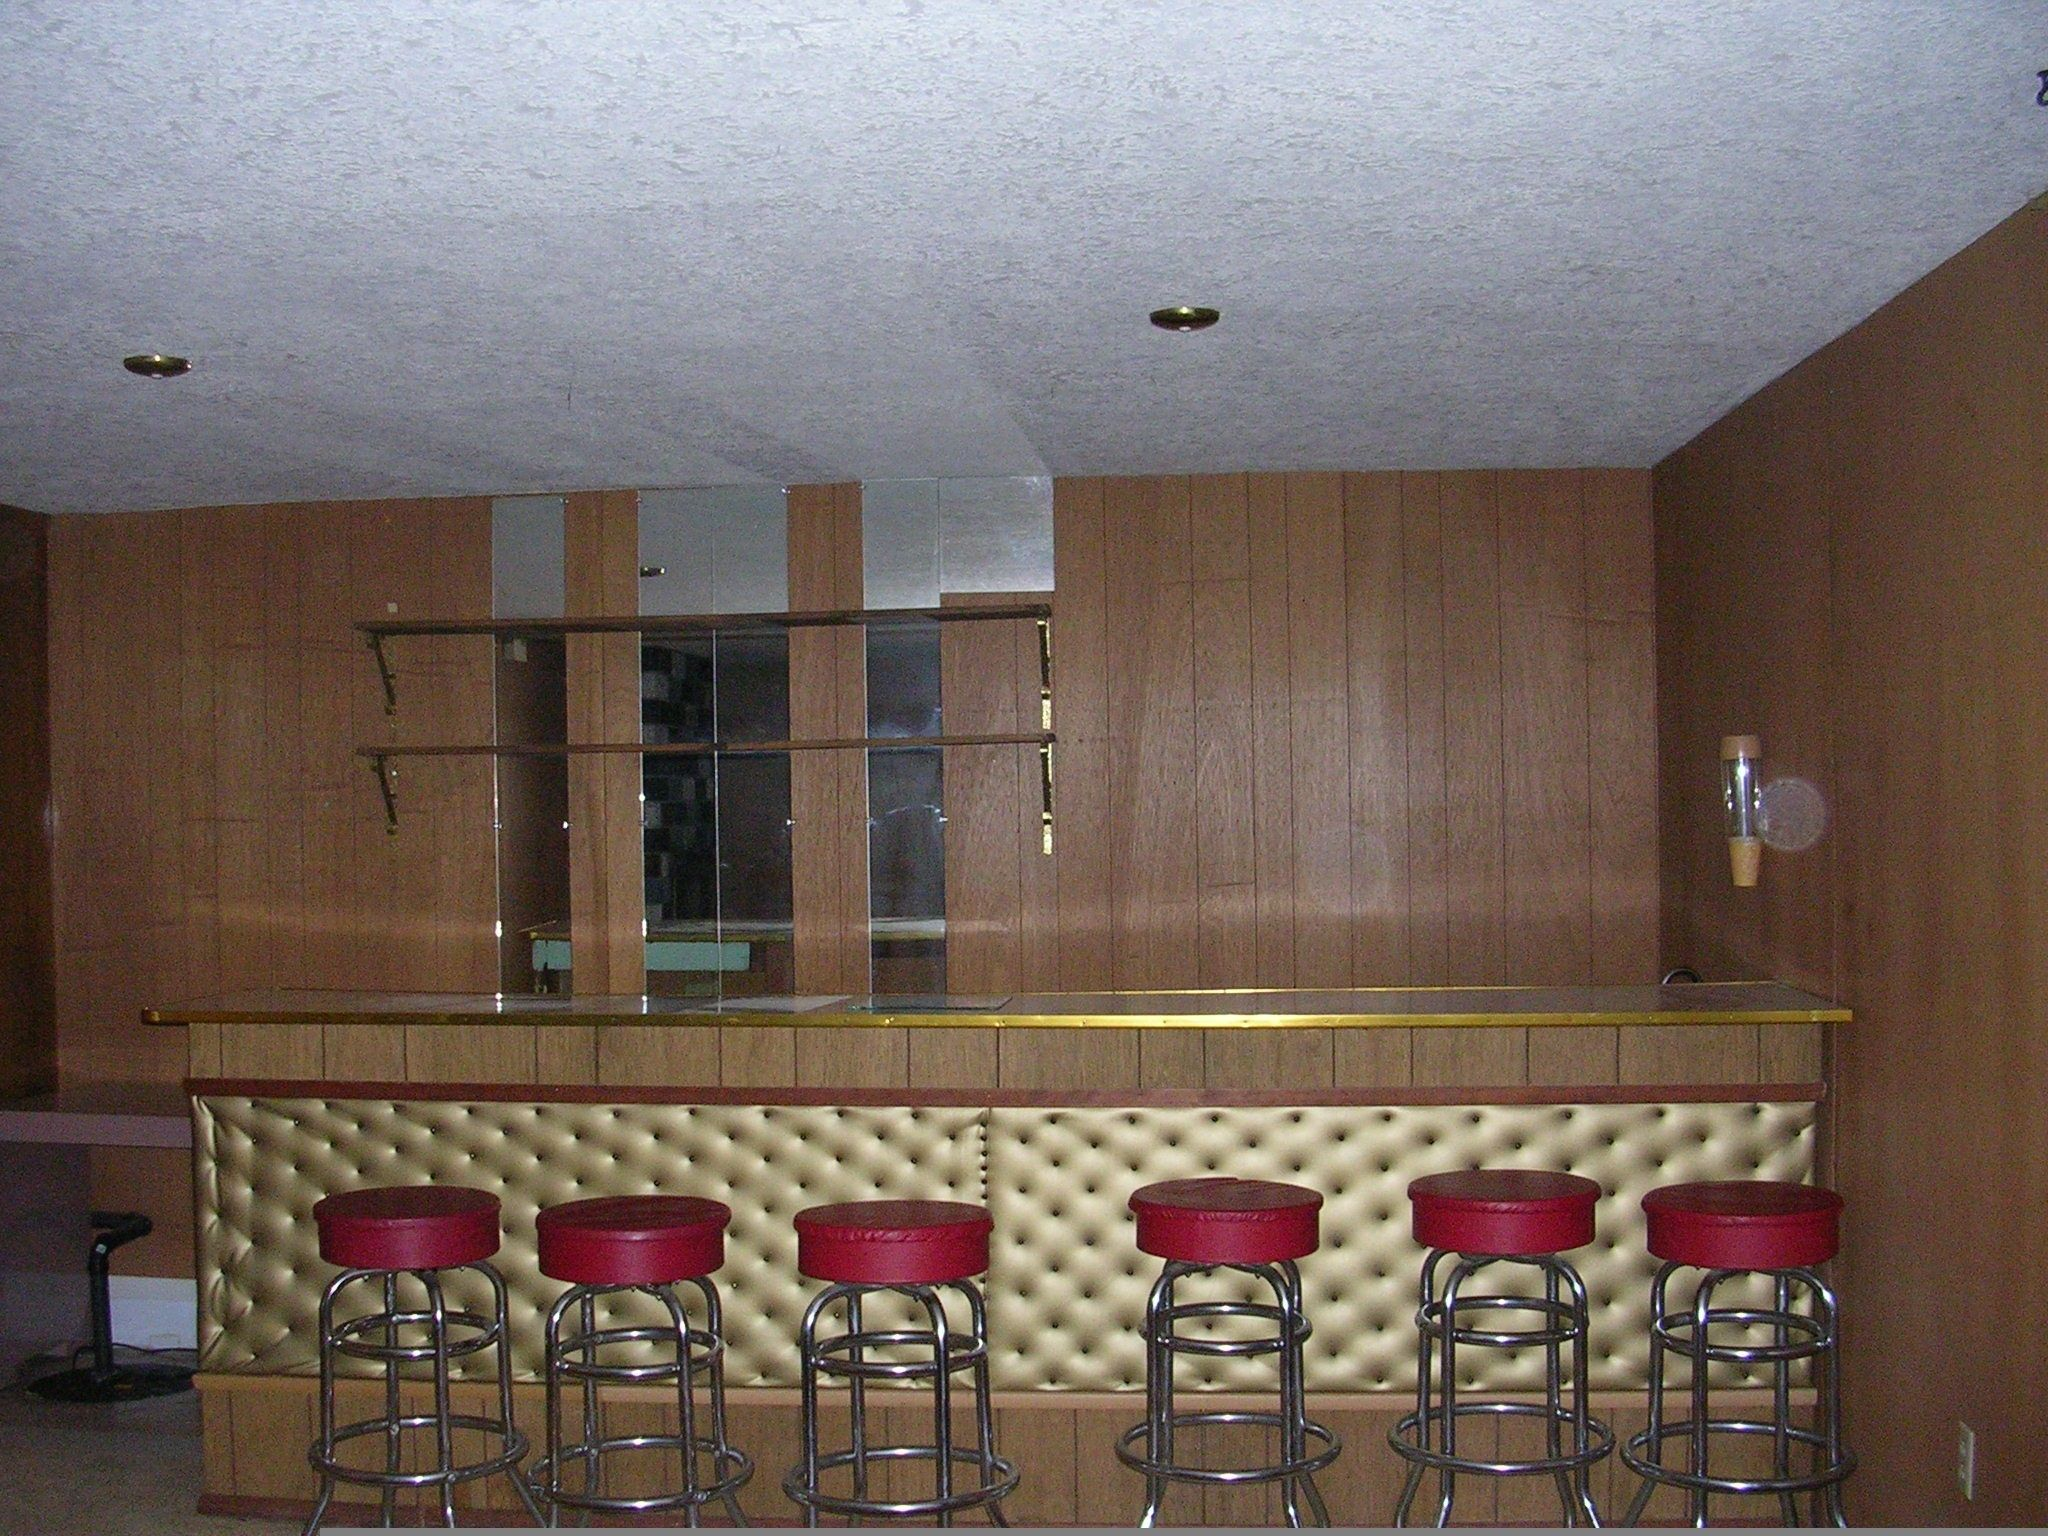 chens kitchen newyorkfashion